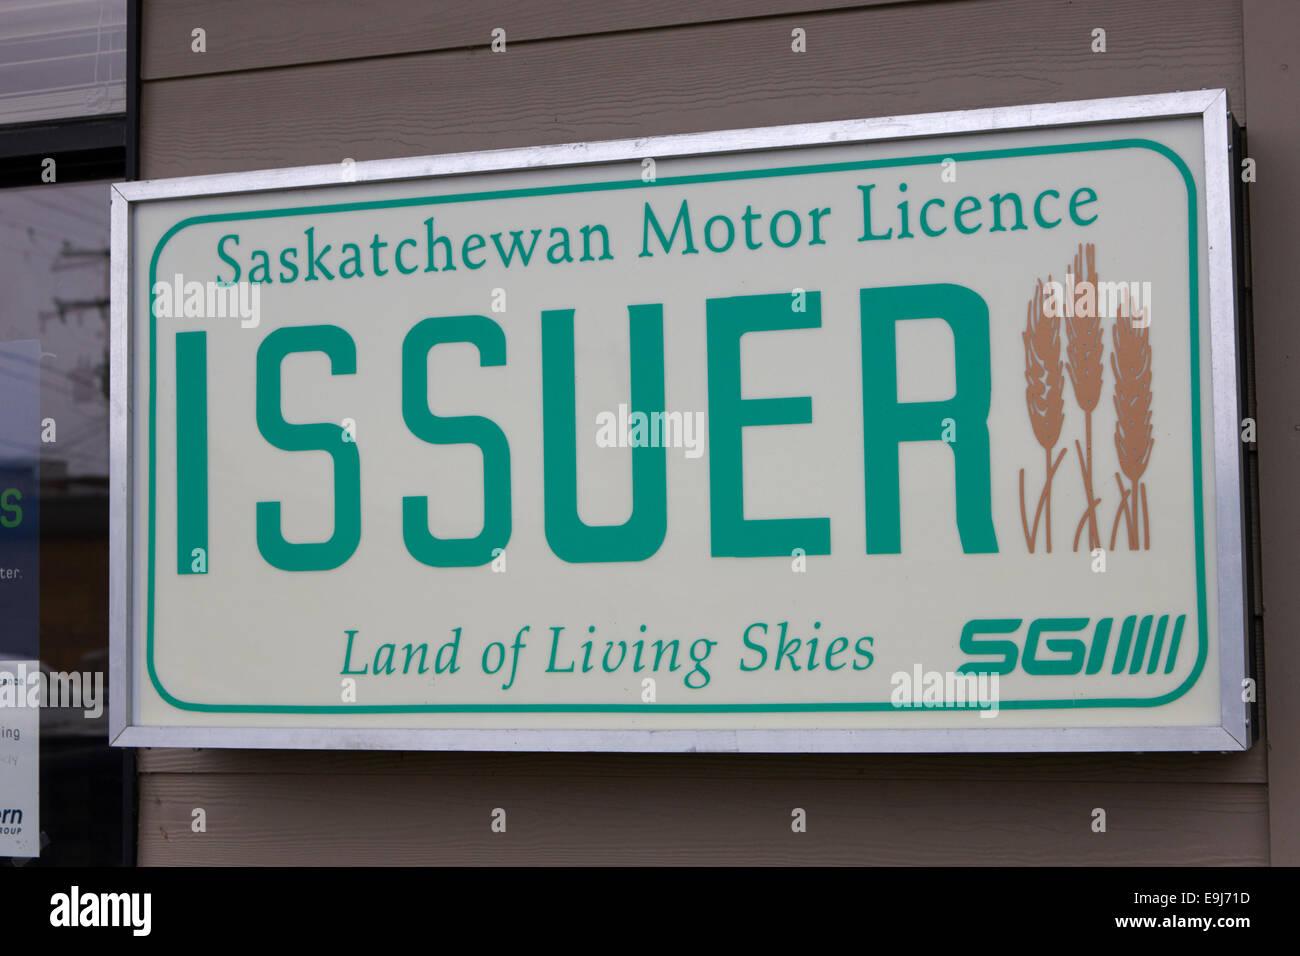 sign for sgi saskatchewan motor licence issuer Saskatchewan Canada - Stock Image